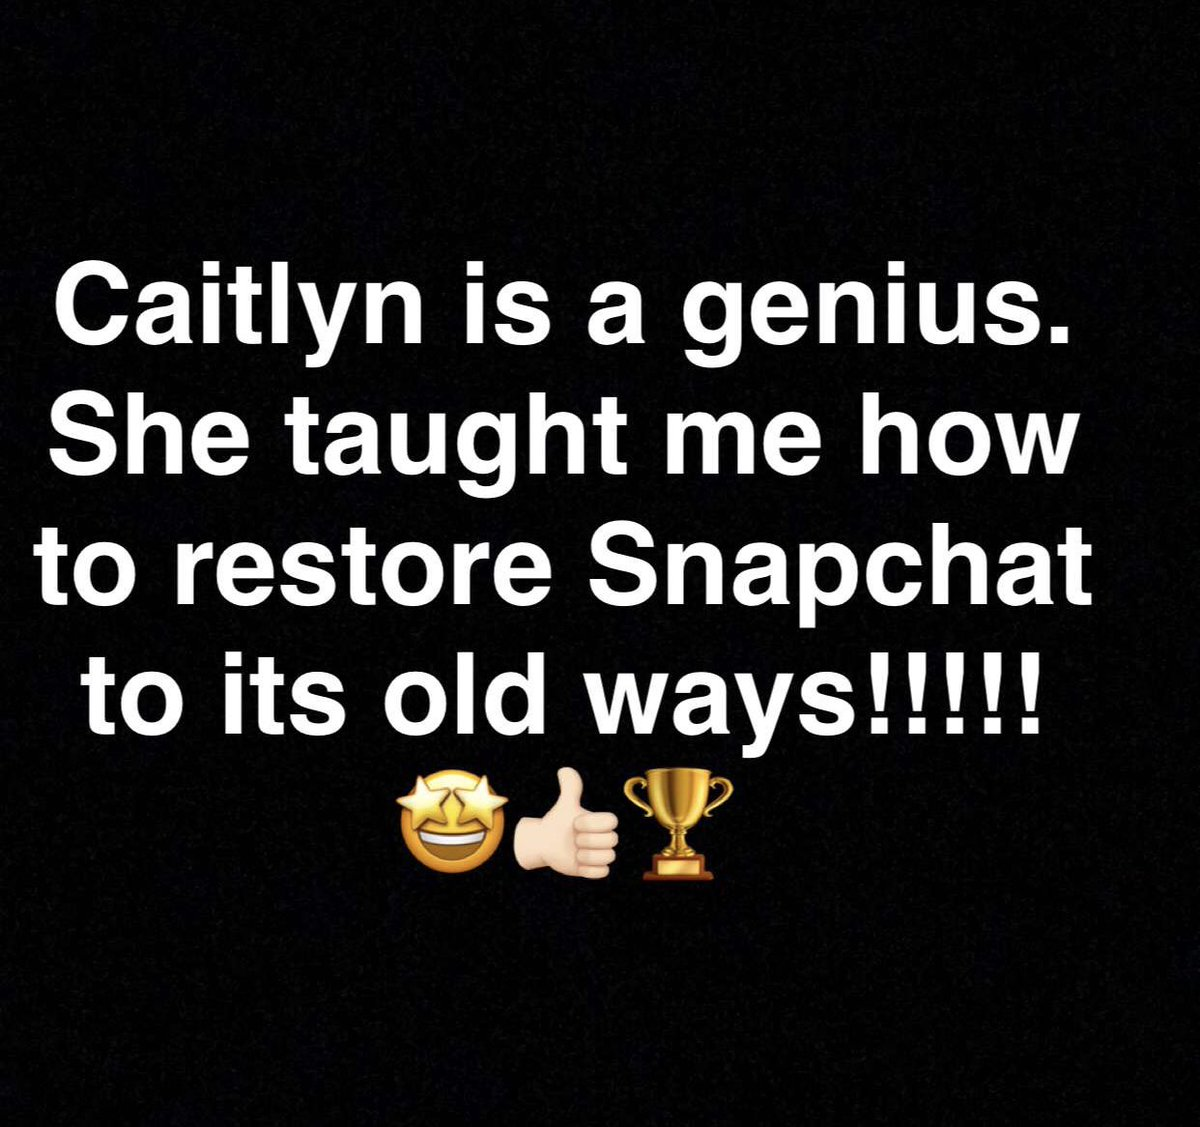 @CaitlynSwopes